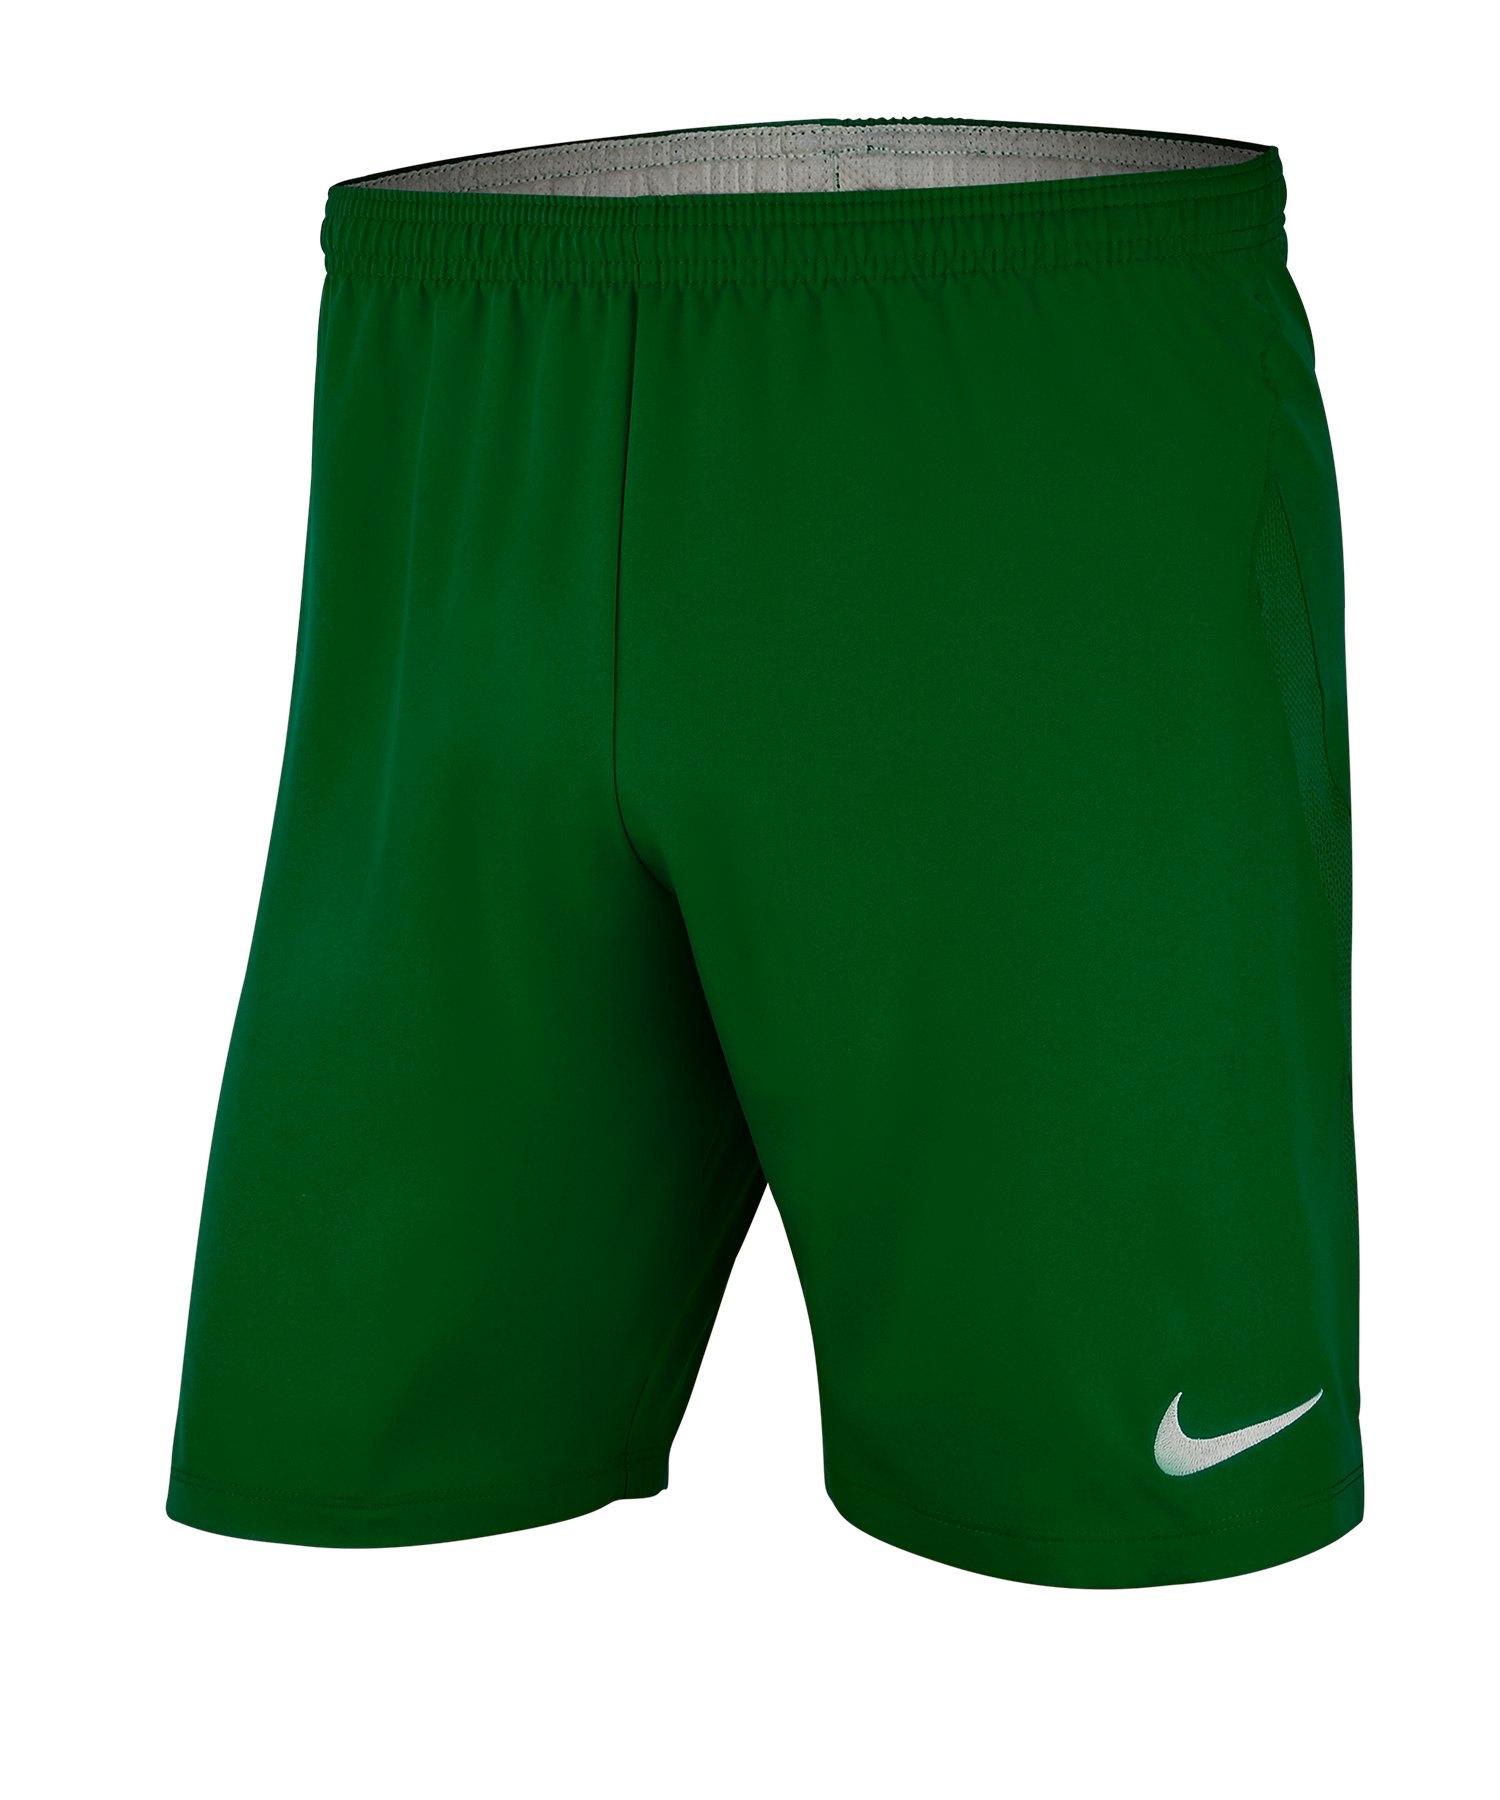 Nike Laser IV Woven Short Grün F302 - gruen